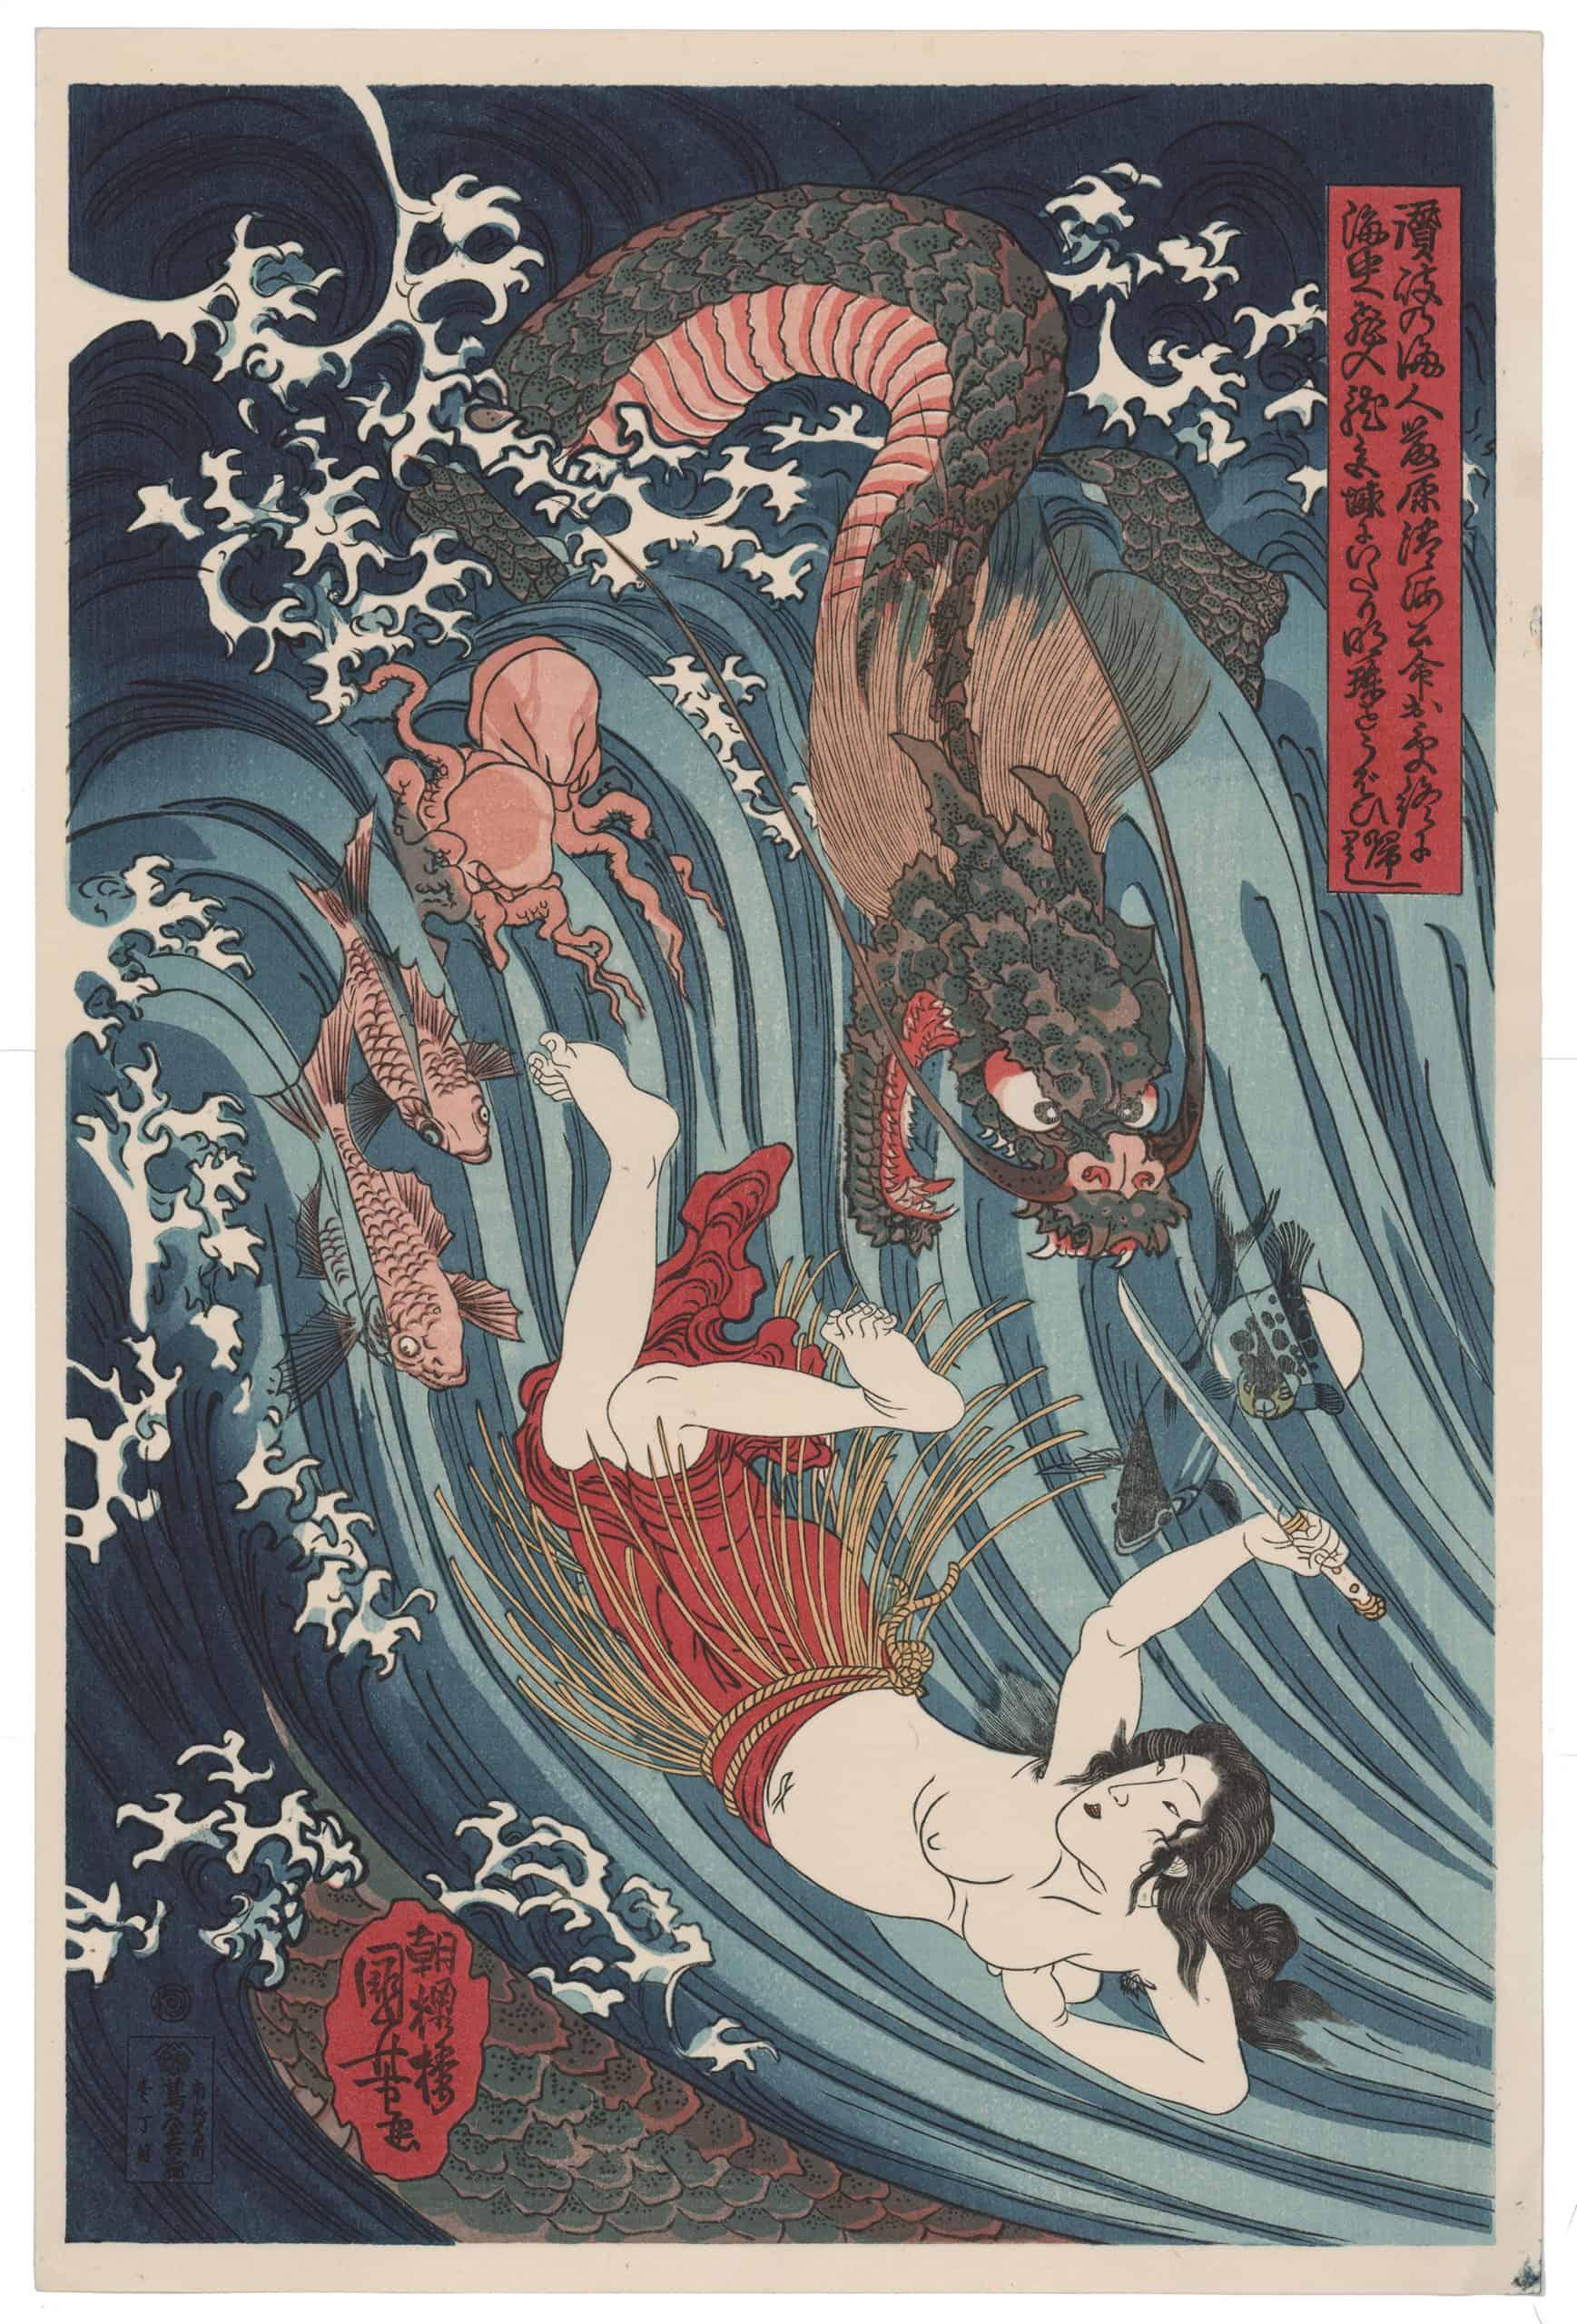 Utagawa Kuniyoshi - Tamatori's Escape from Ryujin and His Sea Creatures